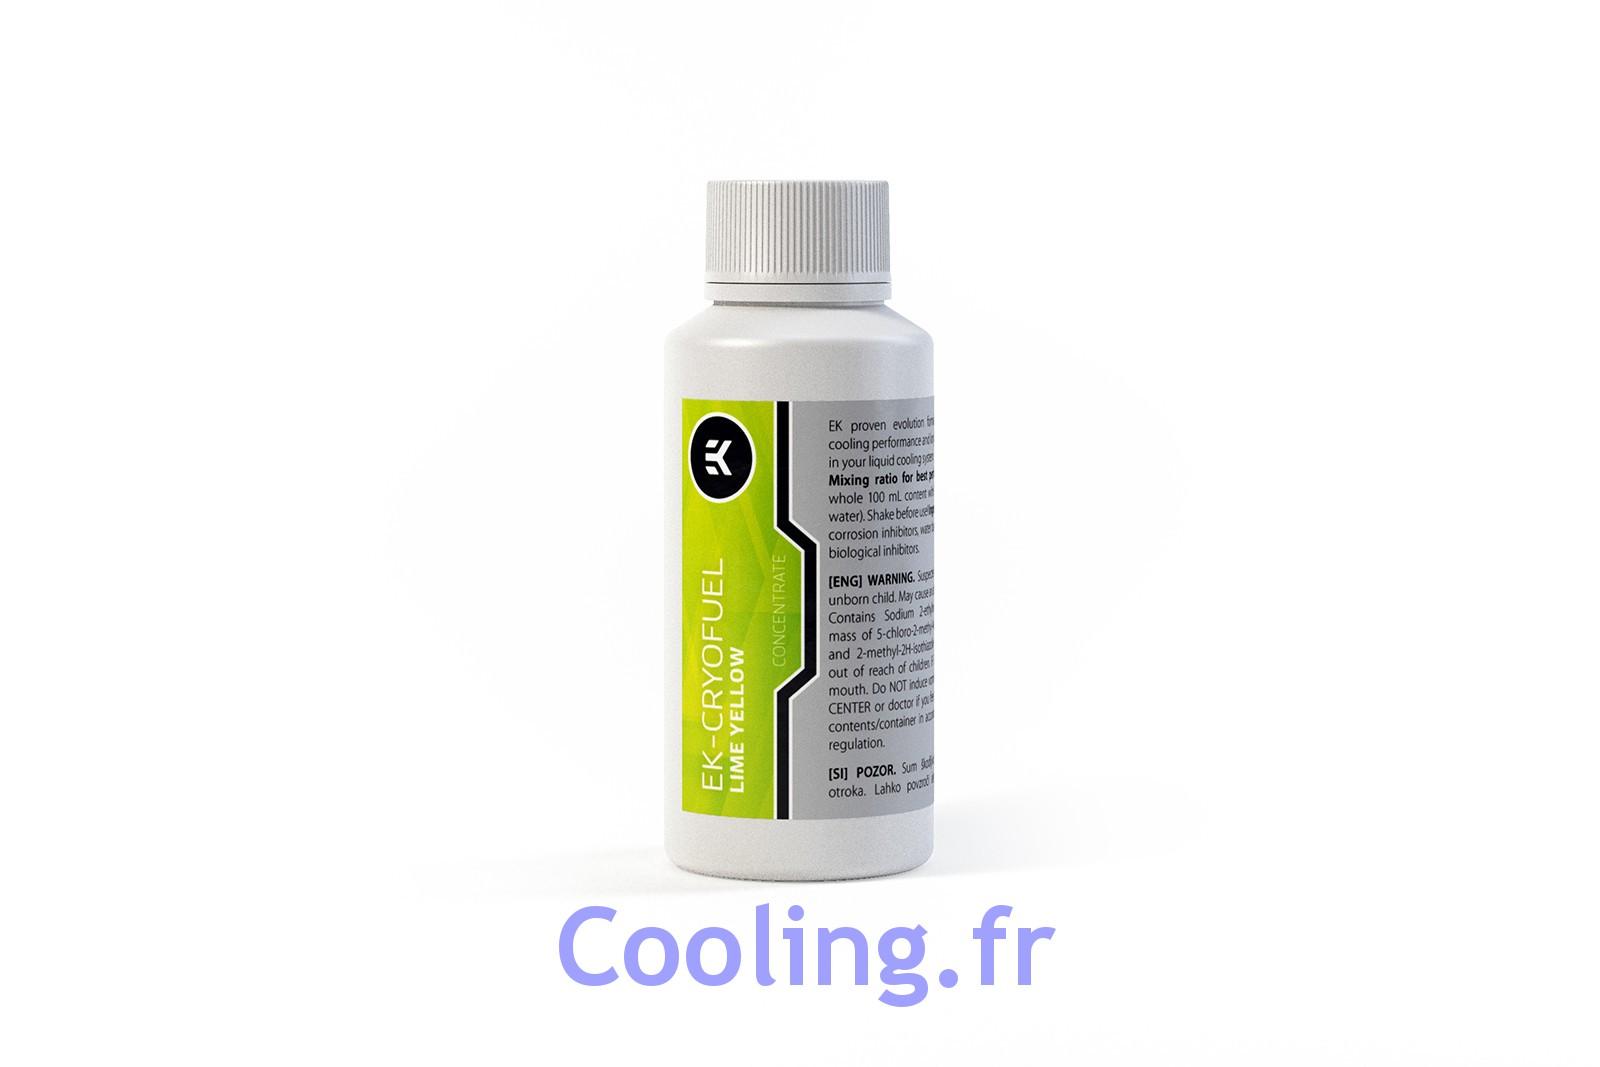 liquide de protection concentr ek cryofuel jaune citron uv 100ml ek water blocks. Black Bedroom Furniture Sets. Home Design Ideas